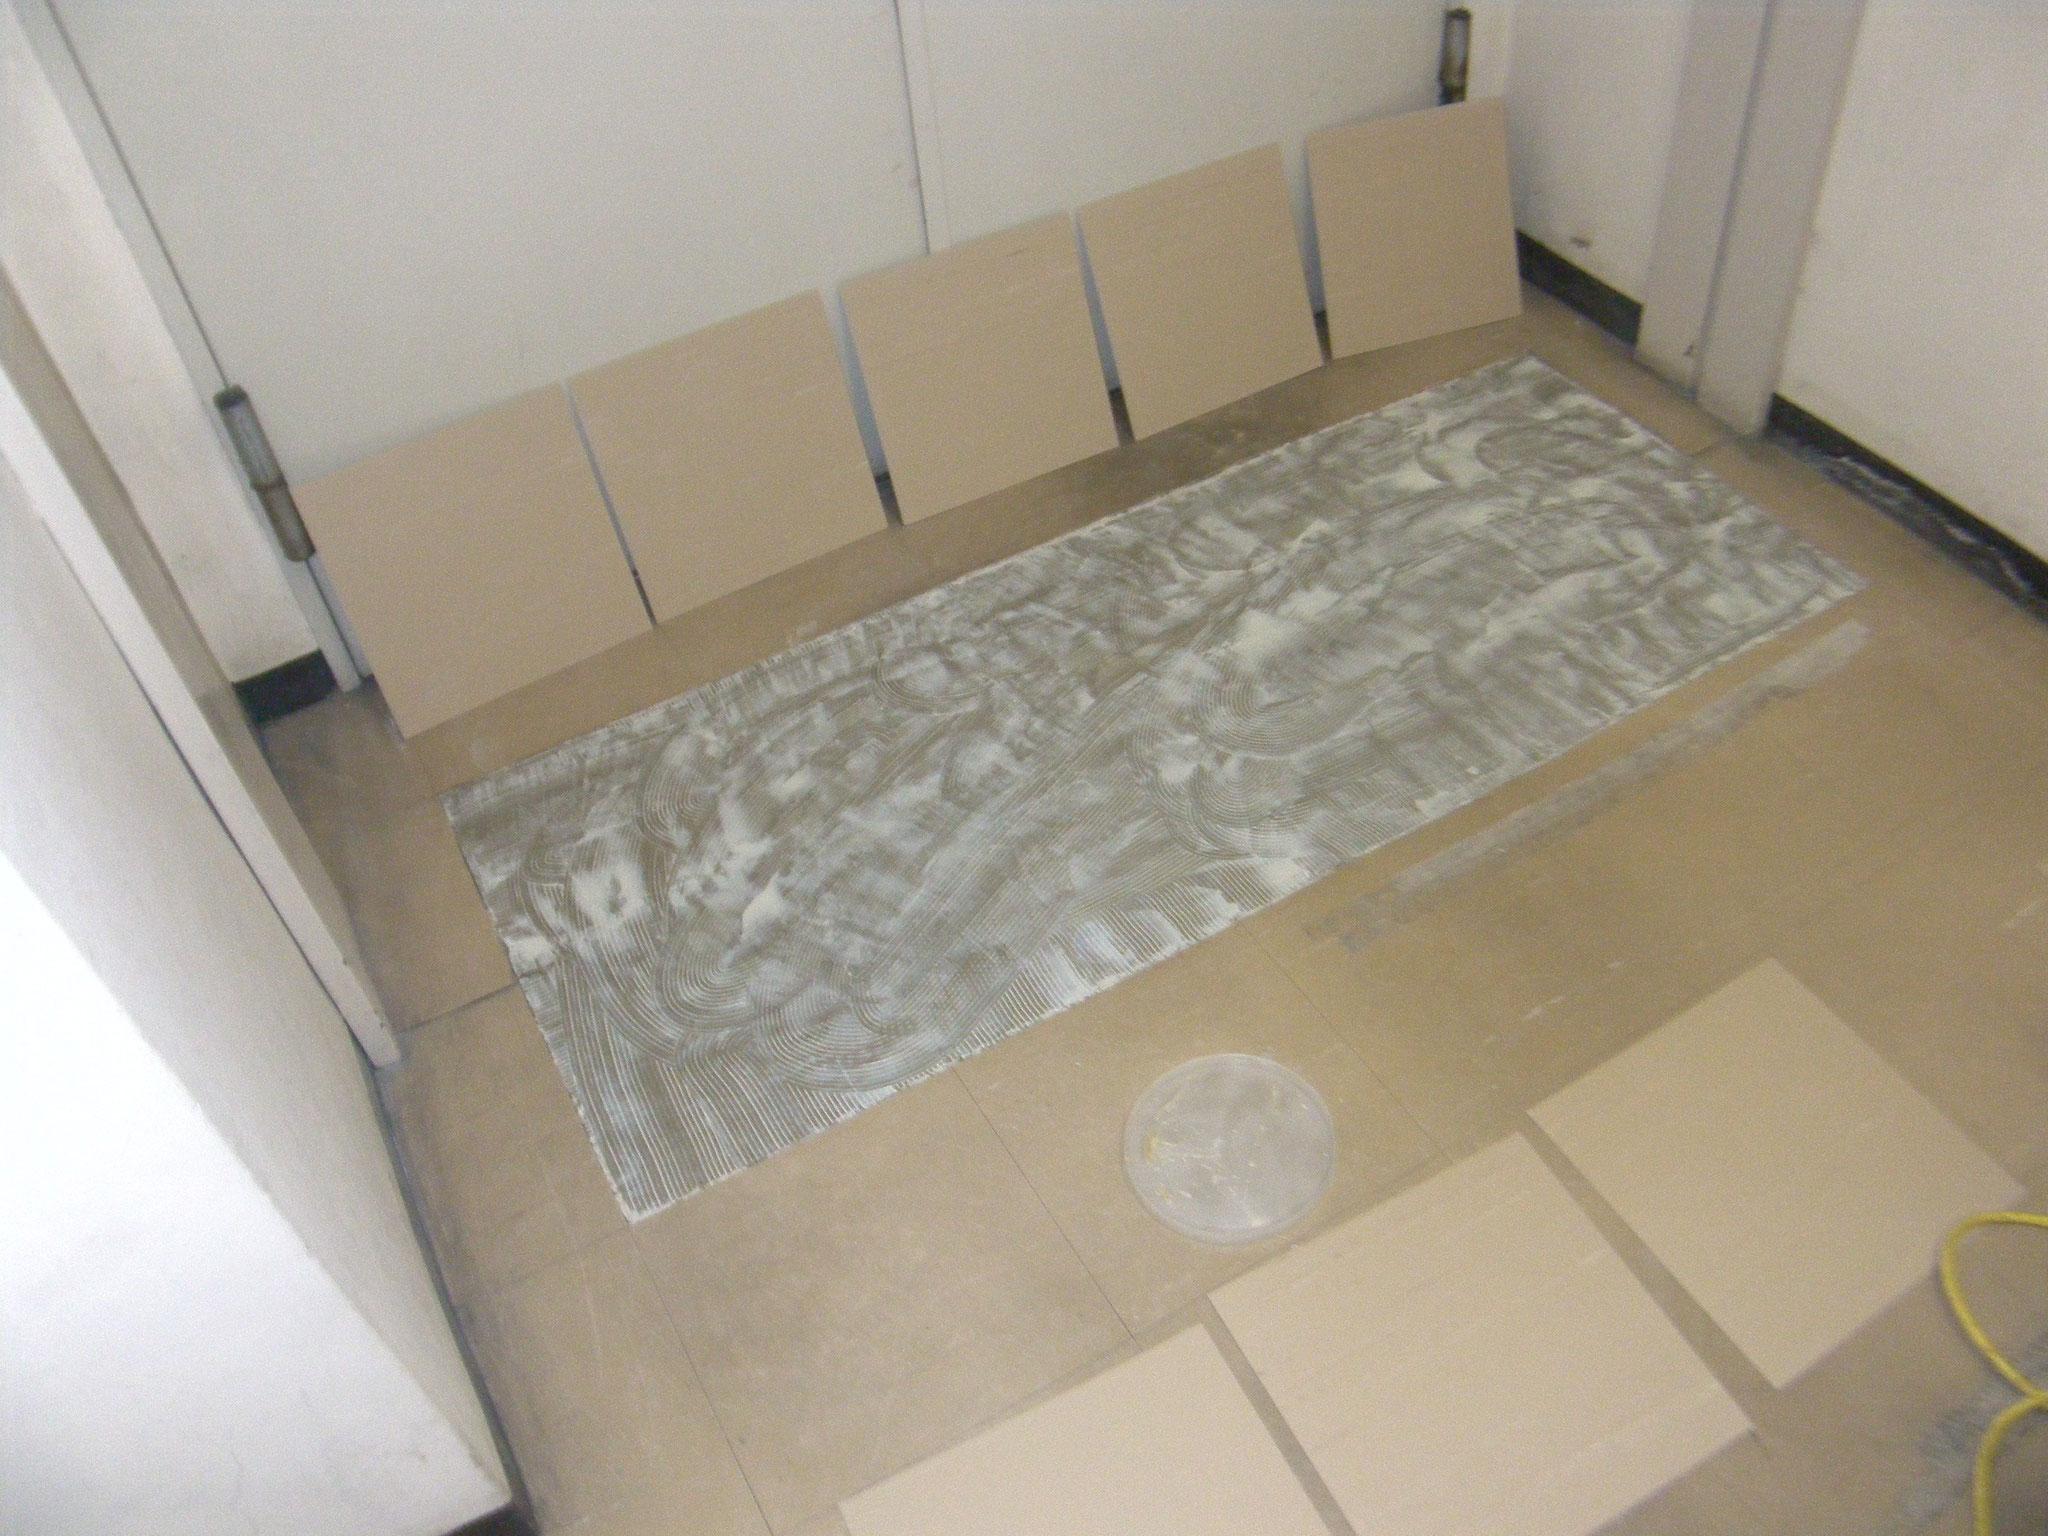 Pタイル床改修工事:工程写真